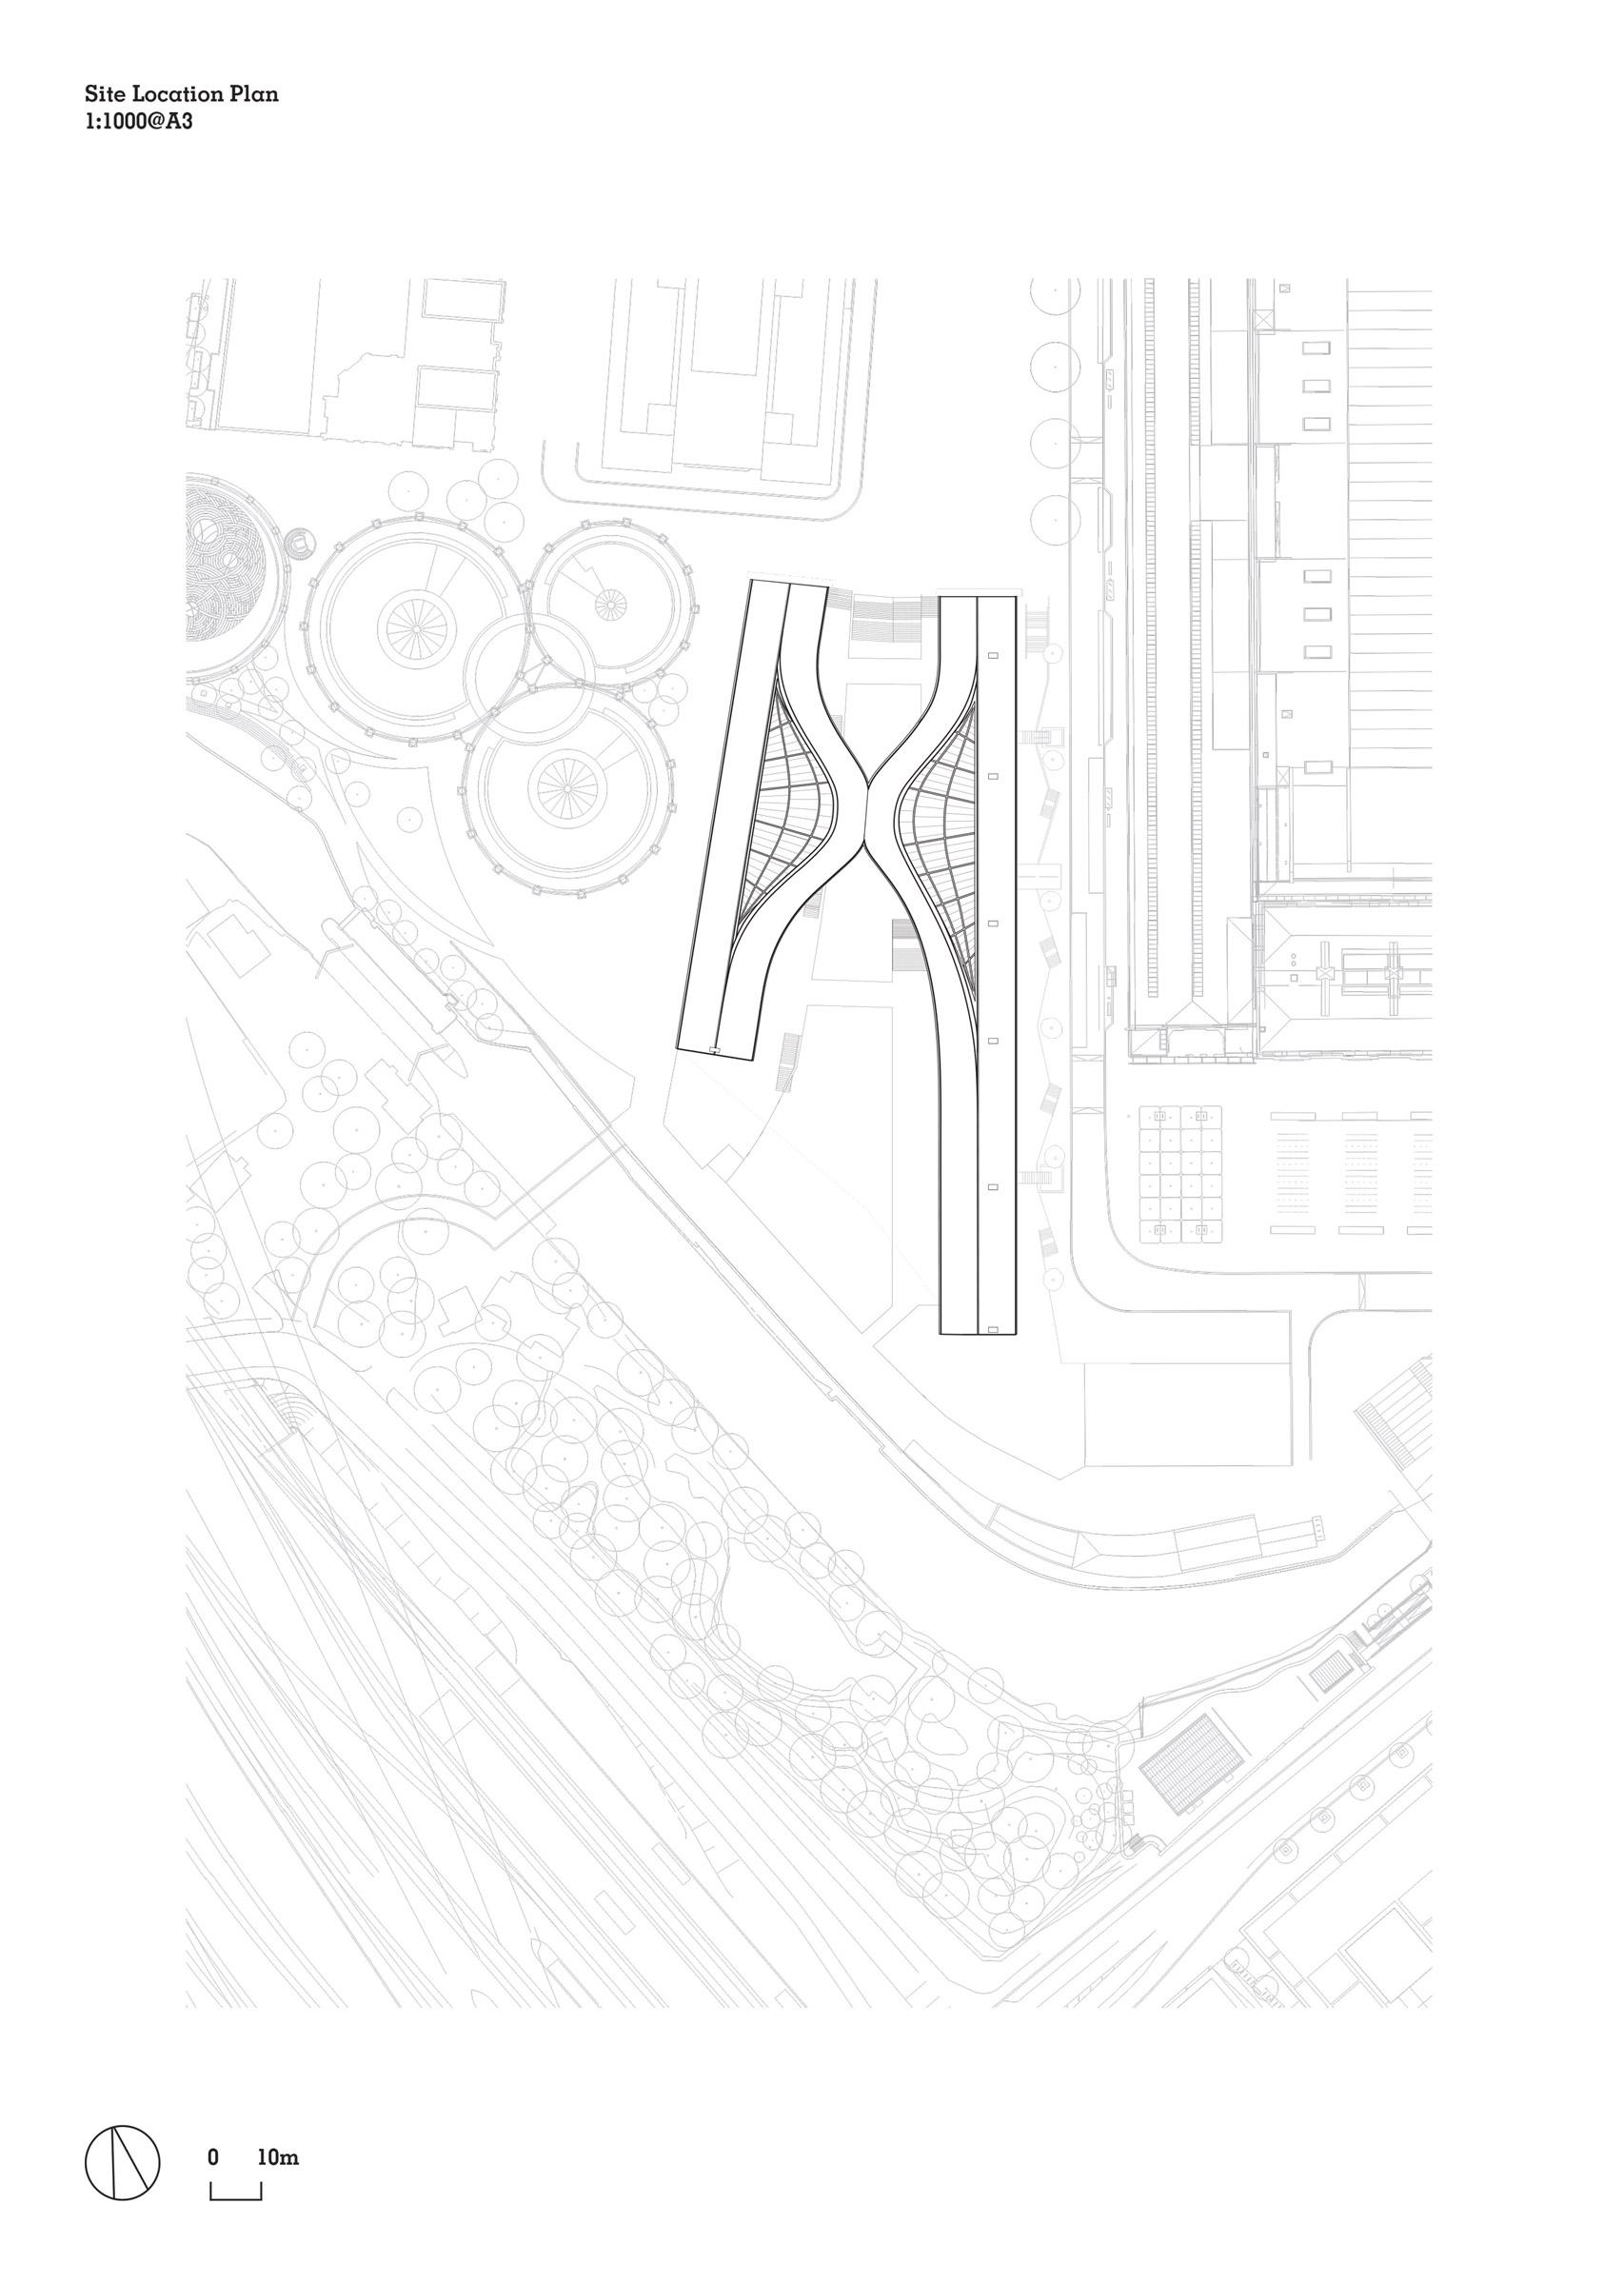 coal-drops-yard-thomas-heatherwick-studio-kings-cross-architecture_dezeen_plan_location_plan